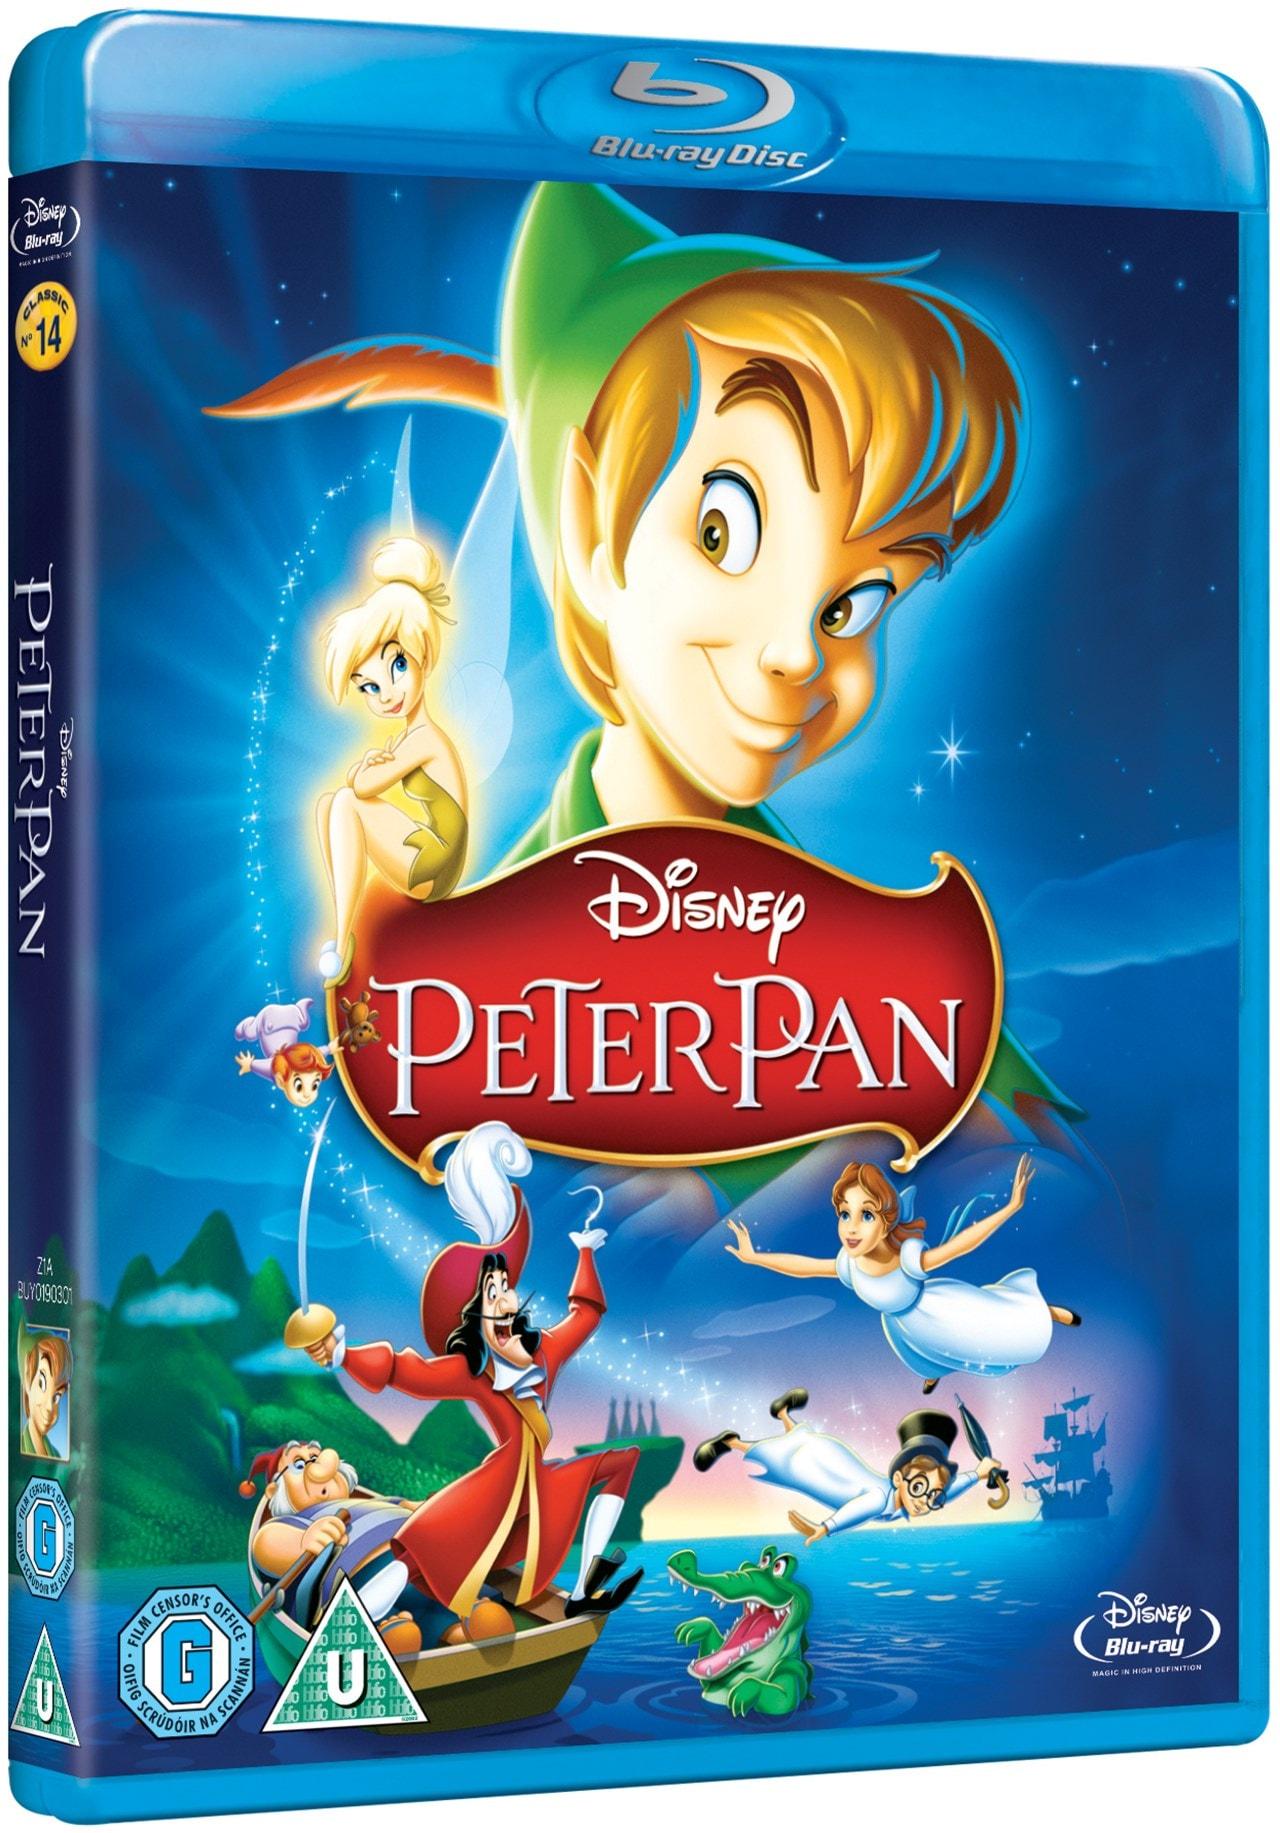 Peter Pan (Disney) - 4